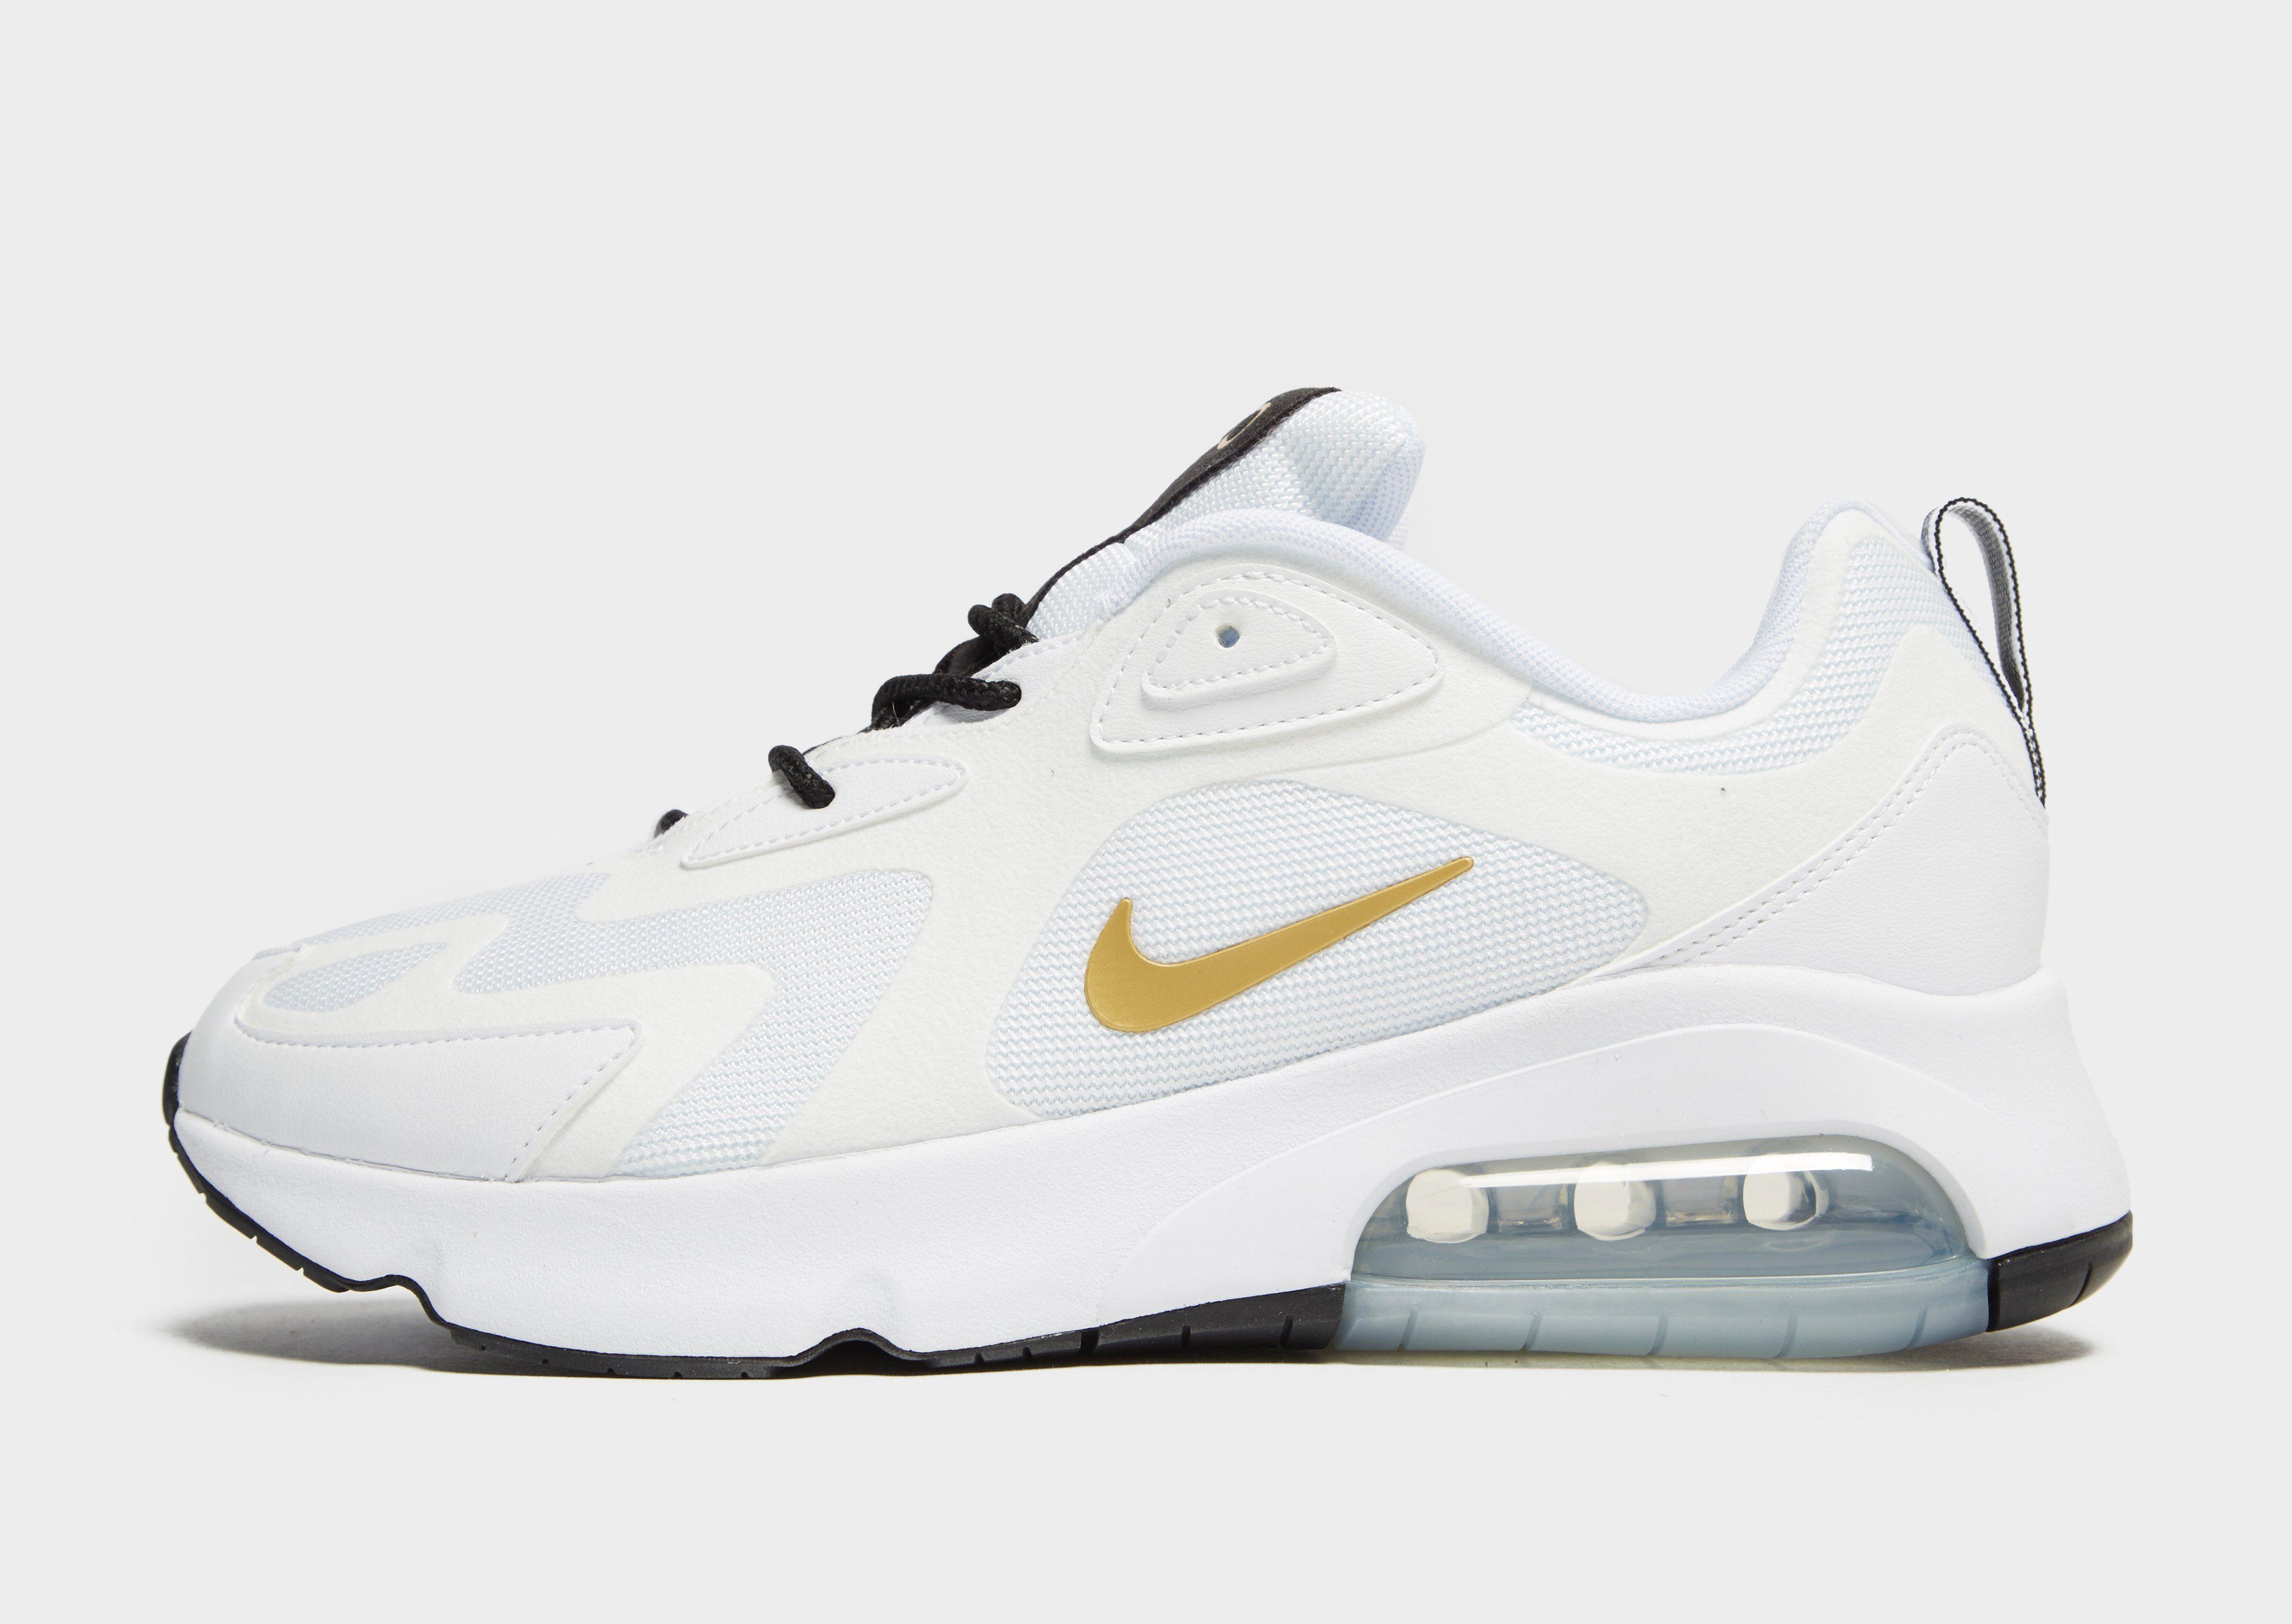 nouvelle arrivee 924f6 89310 Nike Air Max 200 | JD Sports Ireland